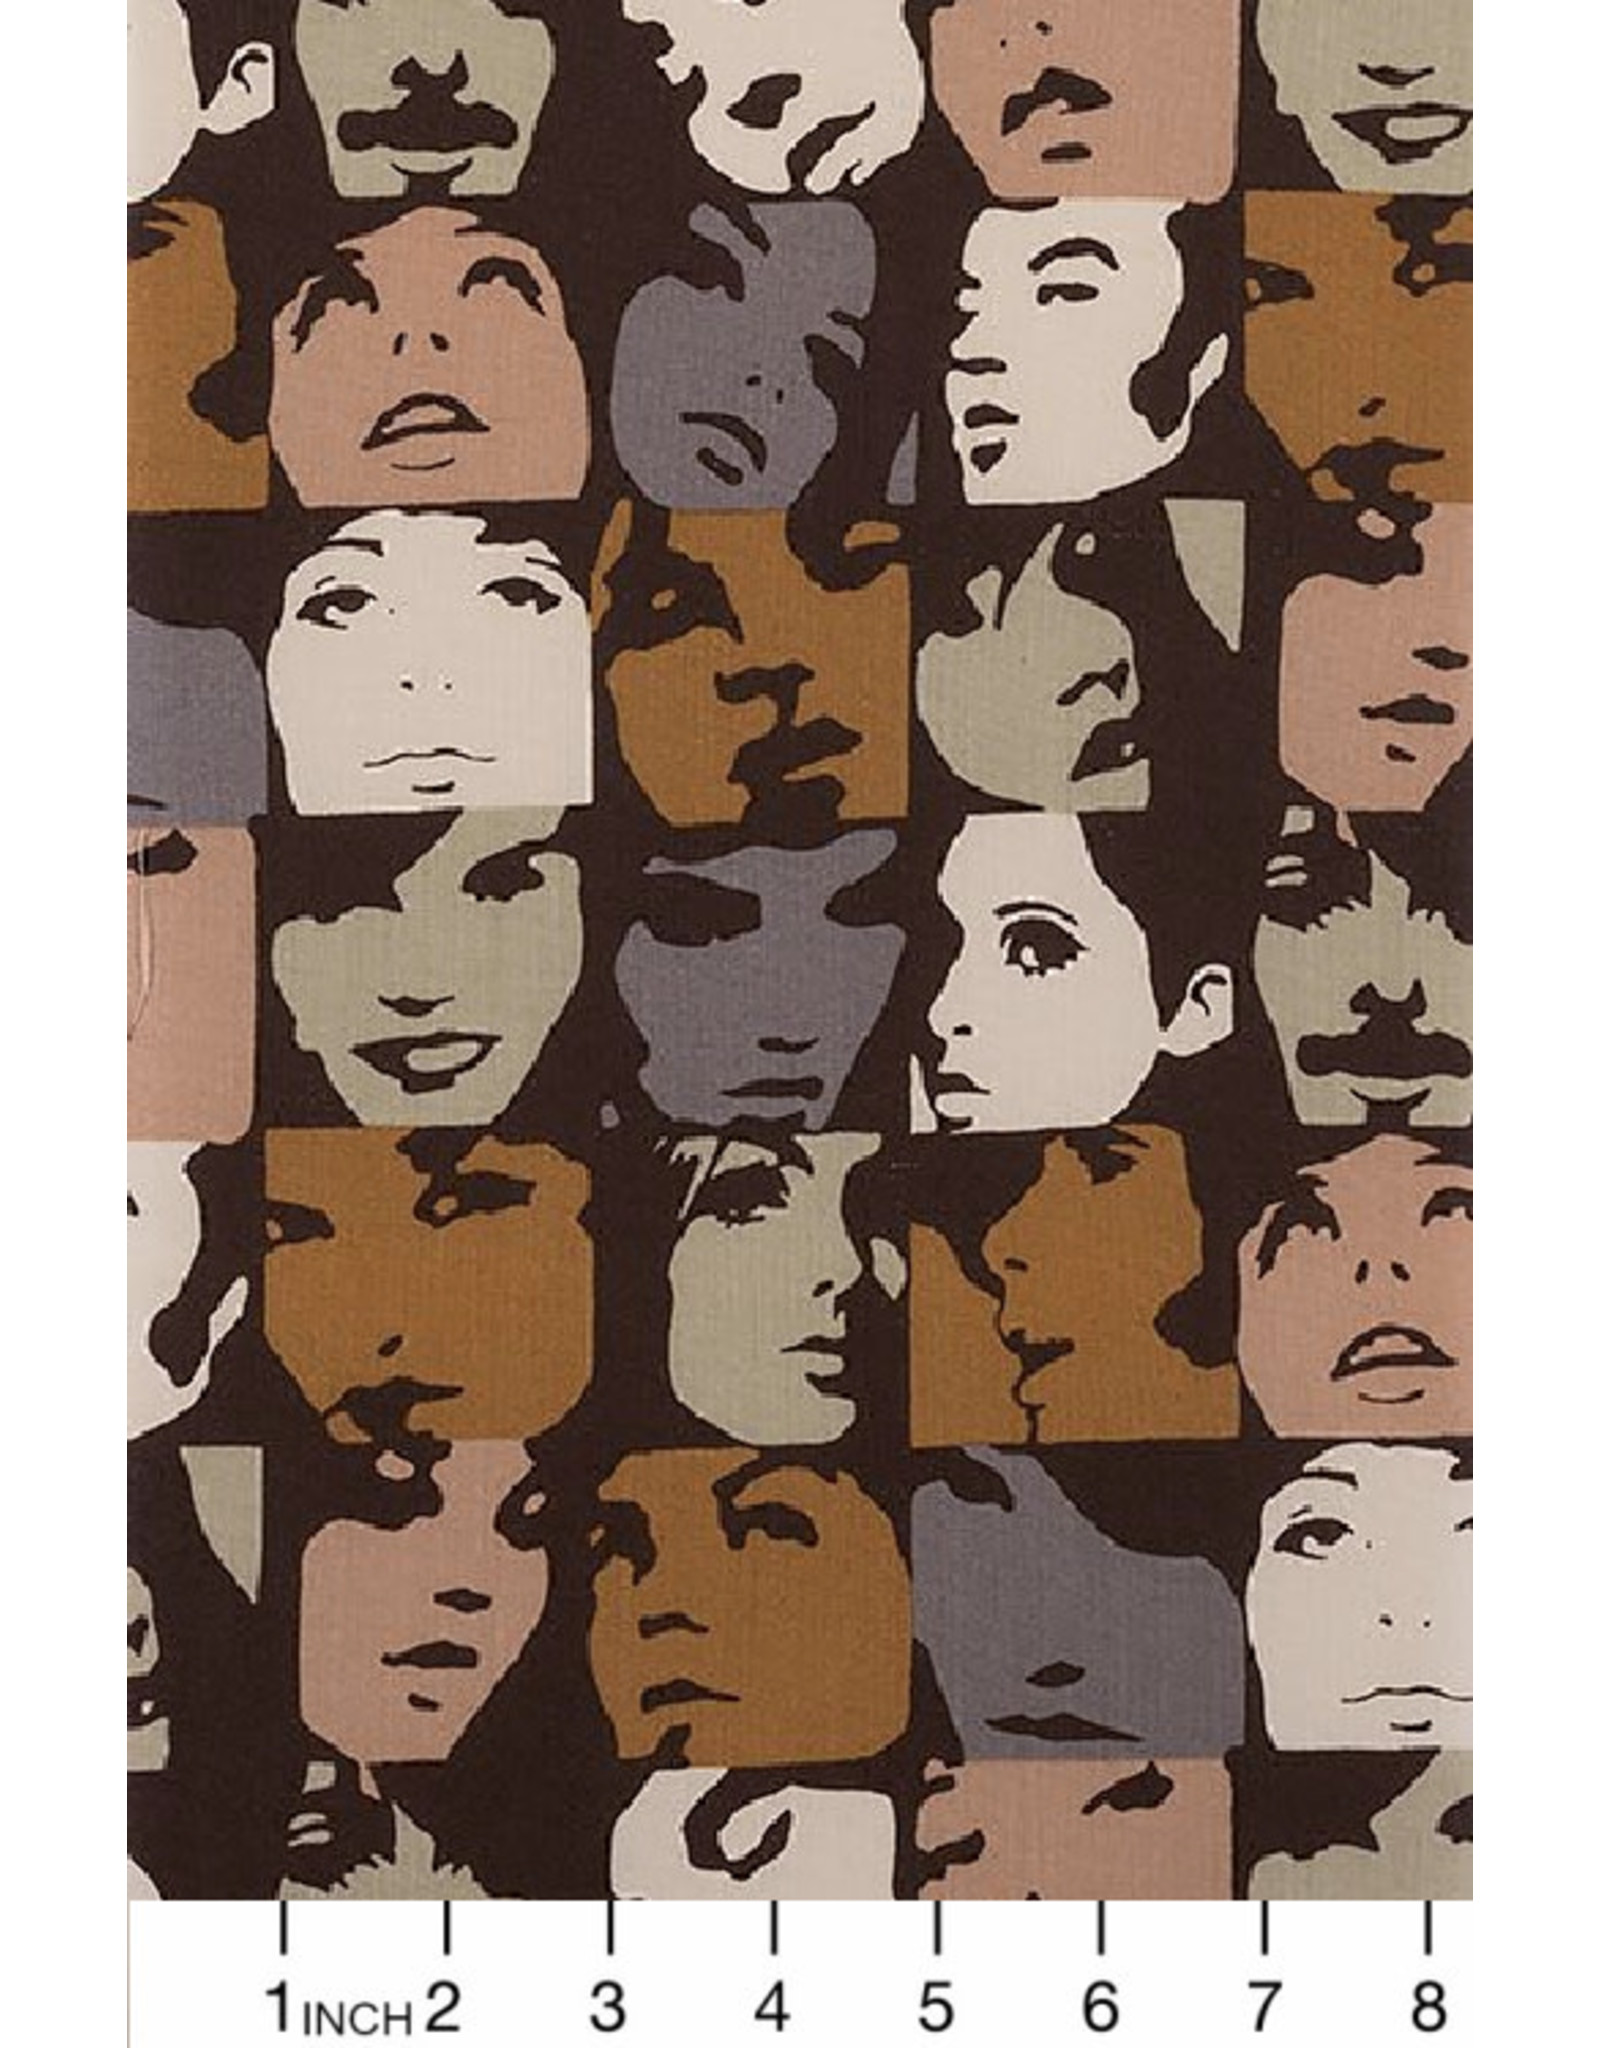 Alexander Henry Fabrics Nicole's Prints, In Crowd in Caramel, Fabric Half-Yards